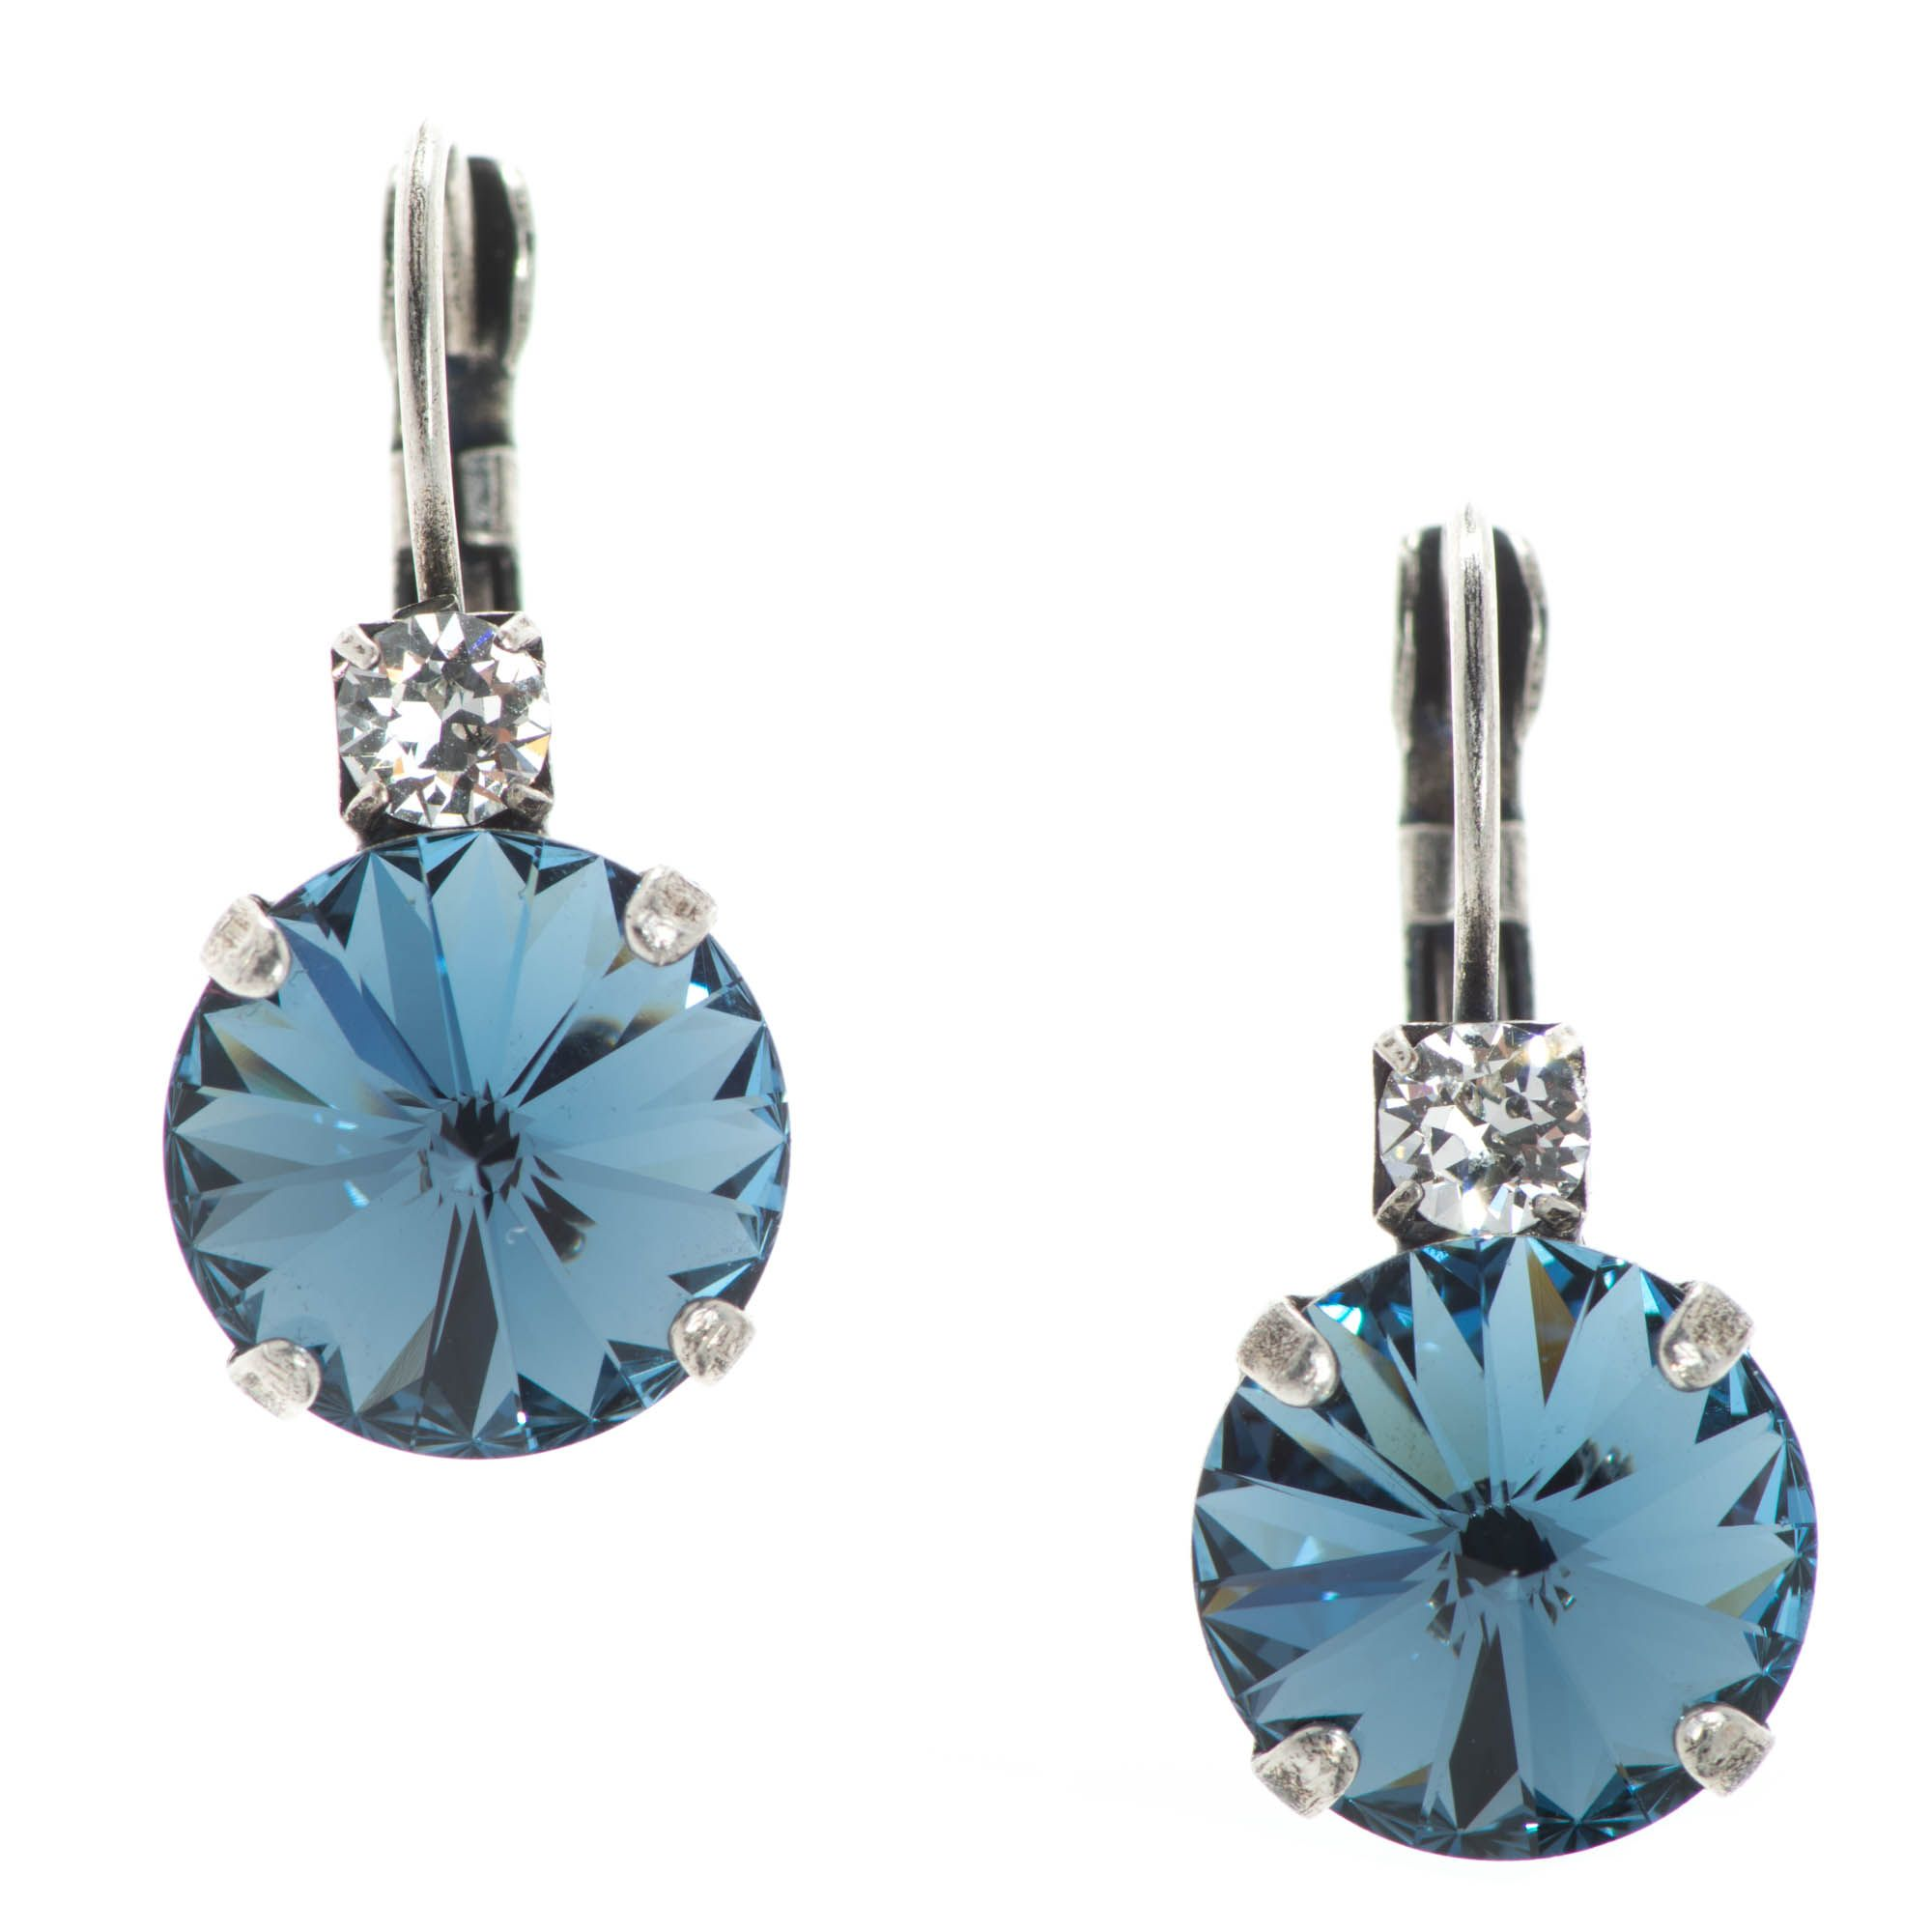 fcb5db2c659c5 Swarovski Earrings Blue - Best All Earring Photos Kamilmaciol.Com